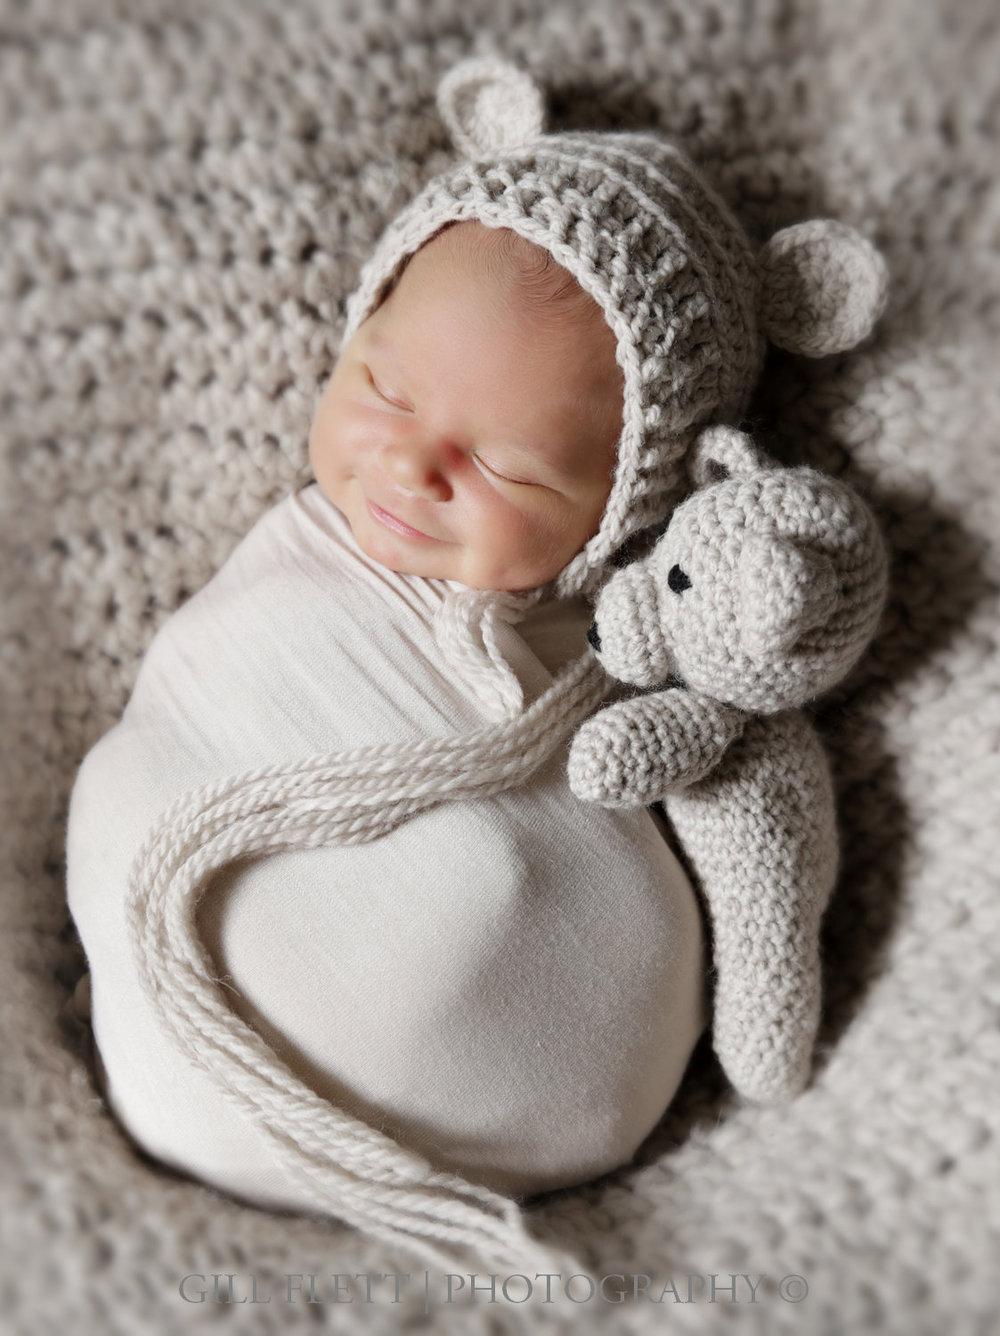 smiling-newborn-teddy-gillflett-london-img_3774.jpg